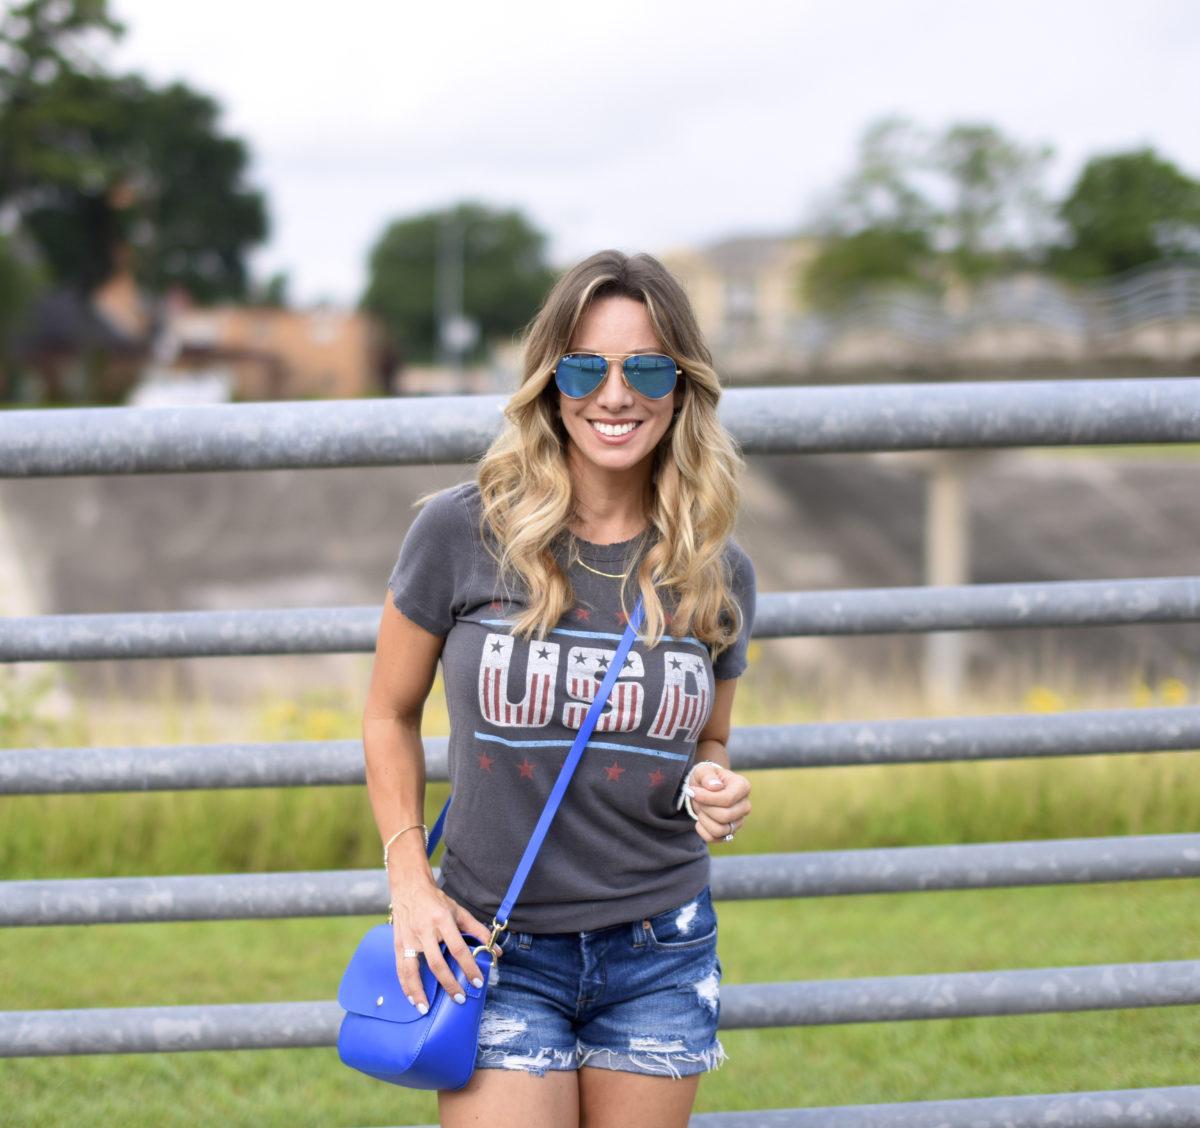 USA tee jean shorts blue bag